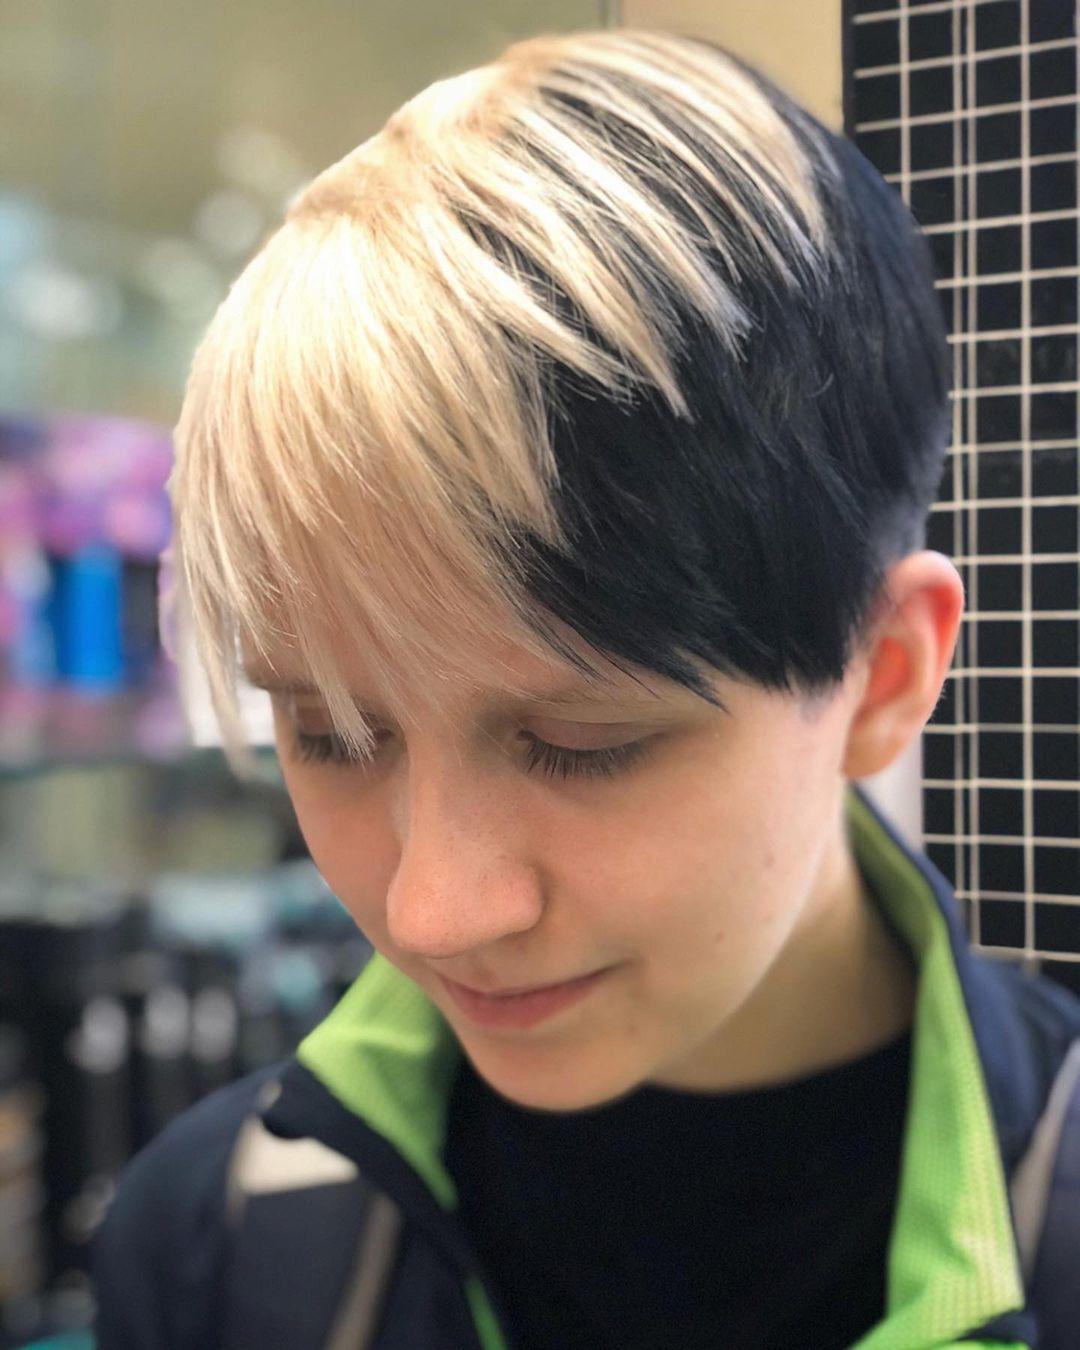 Half Black Half Blonde Pixie Hair Style